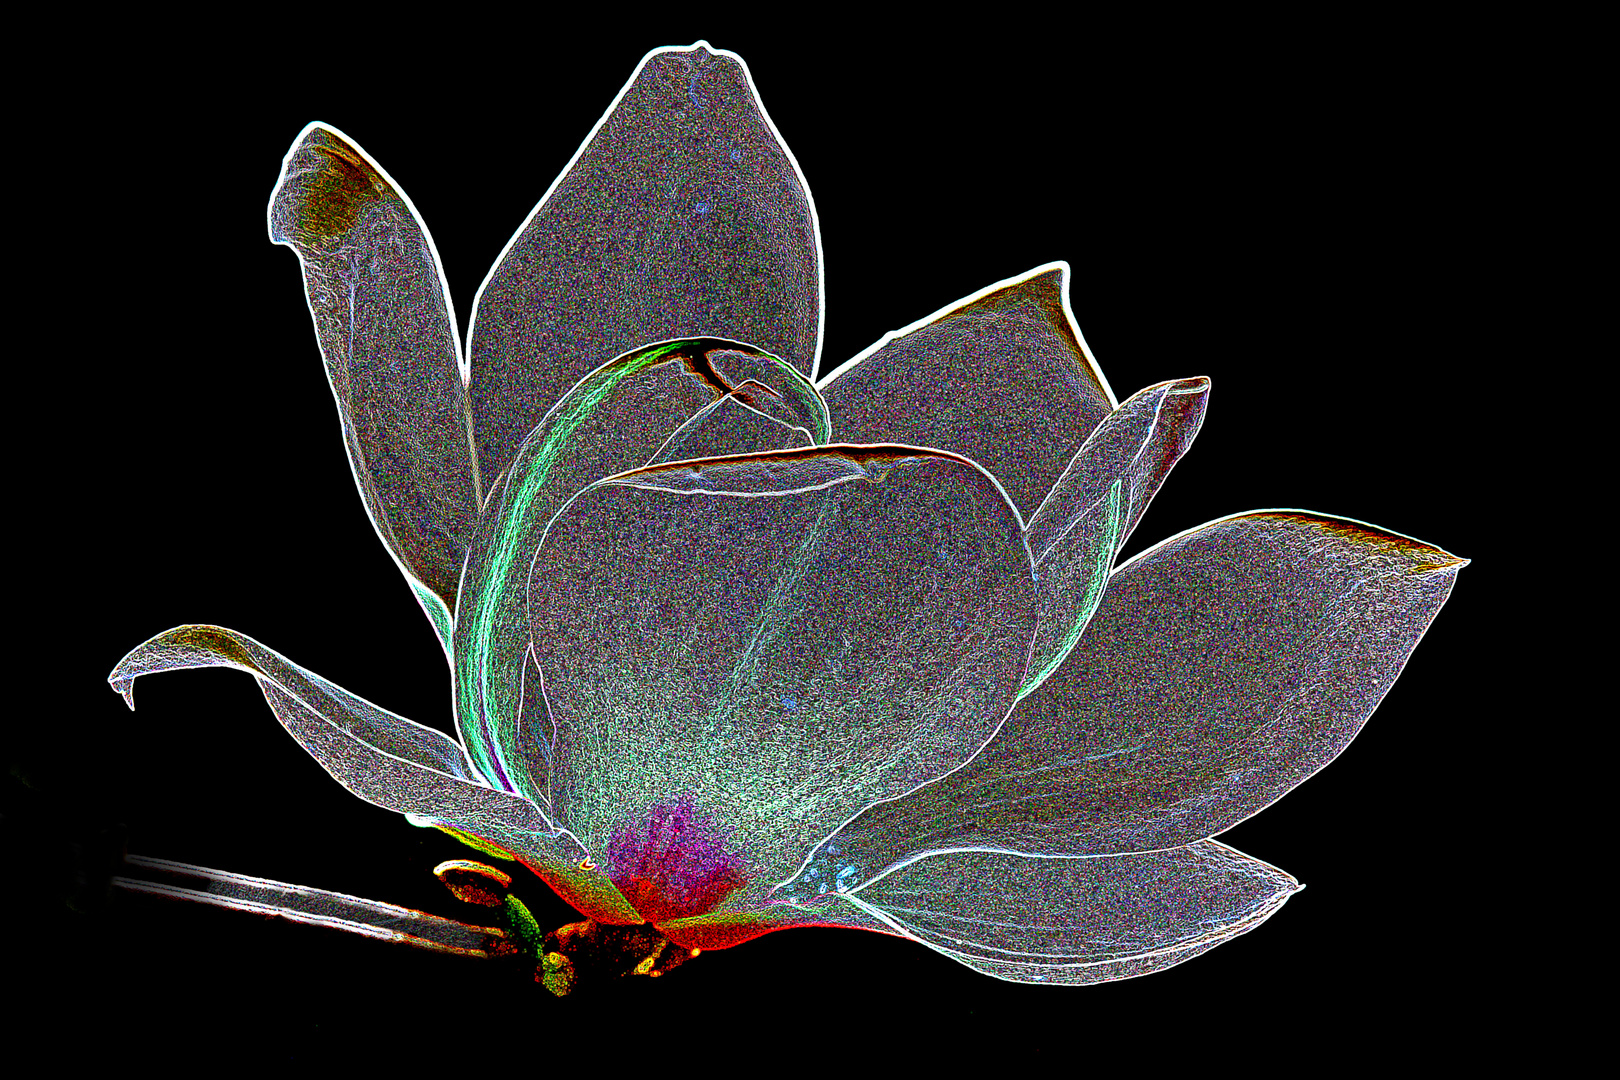 Magniolenblüte